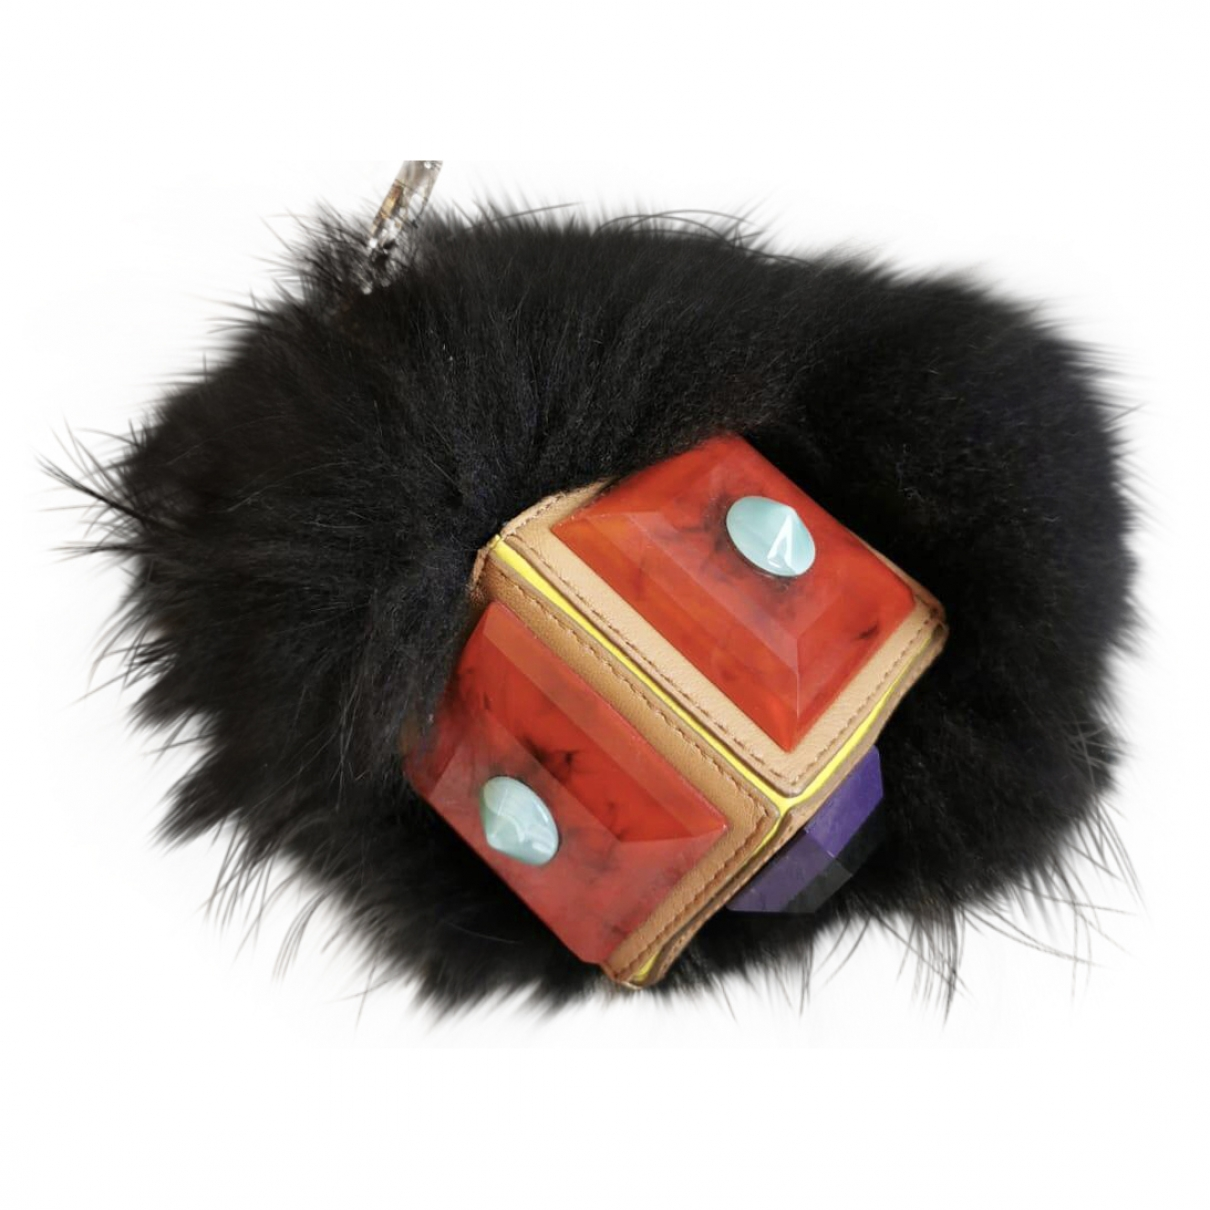 Fendi Bag Bug Taschenschmuck in  Bunt Fuchs